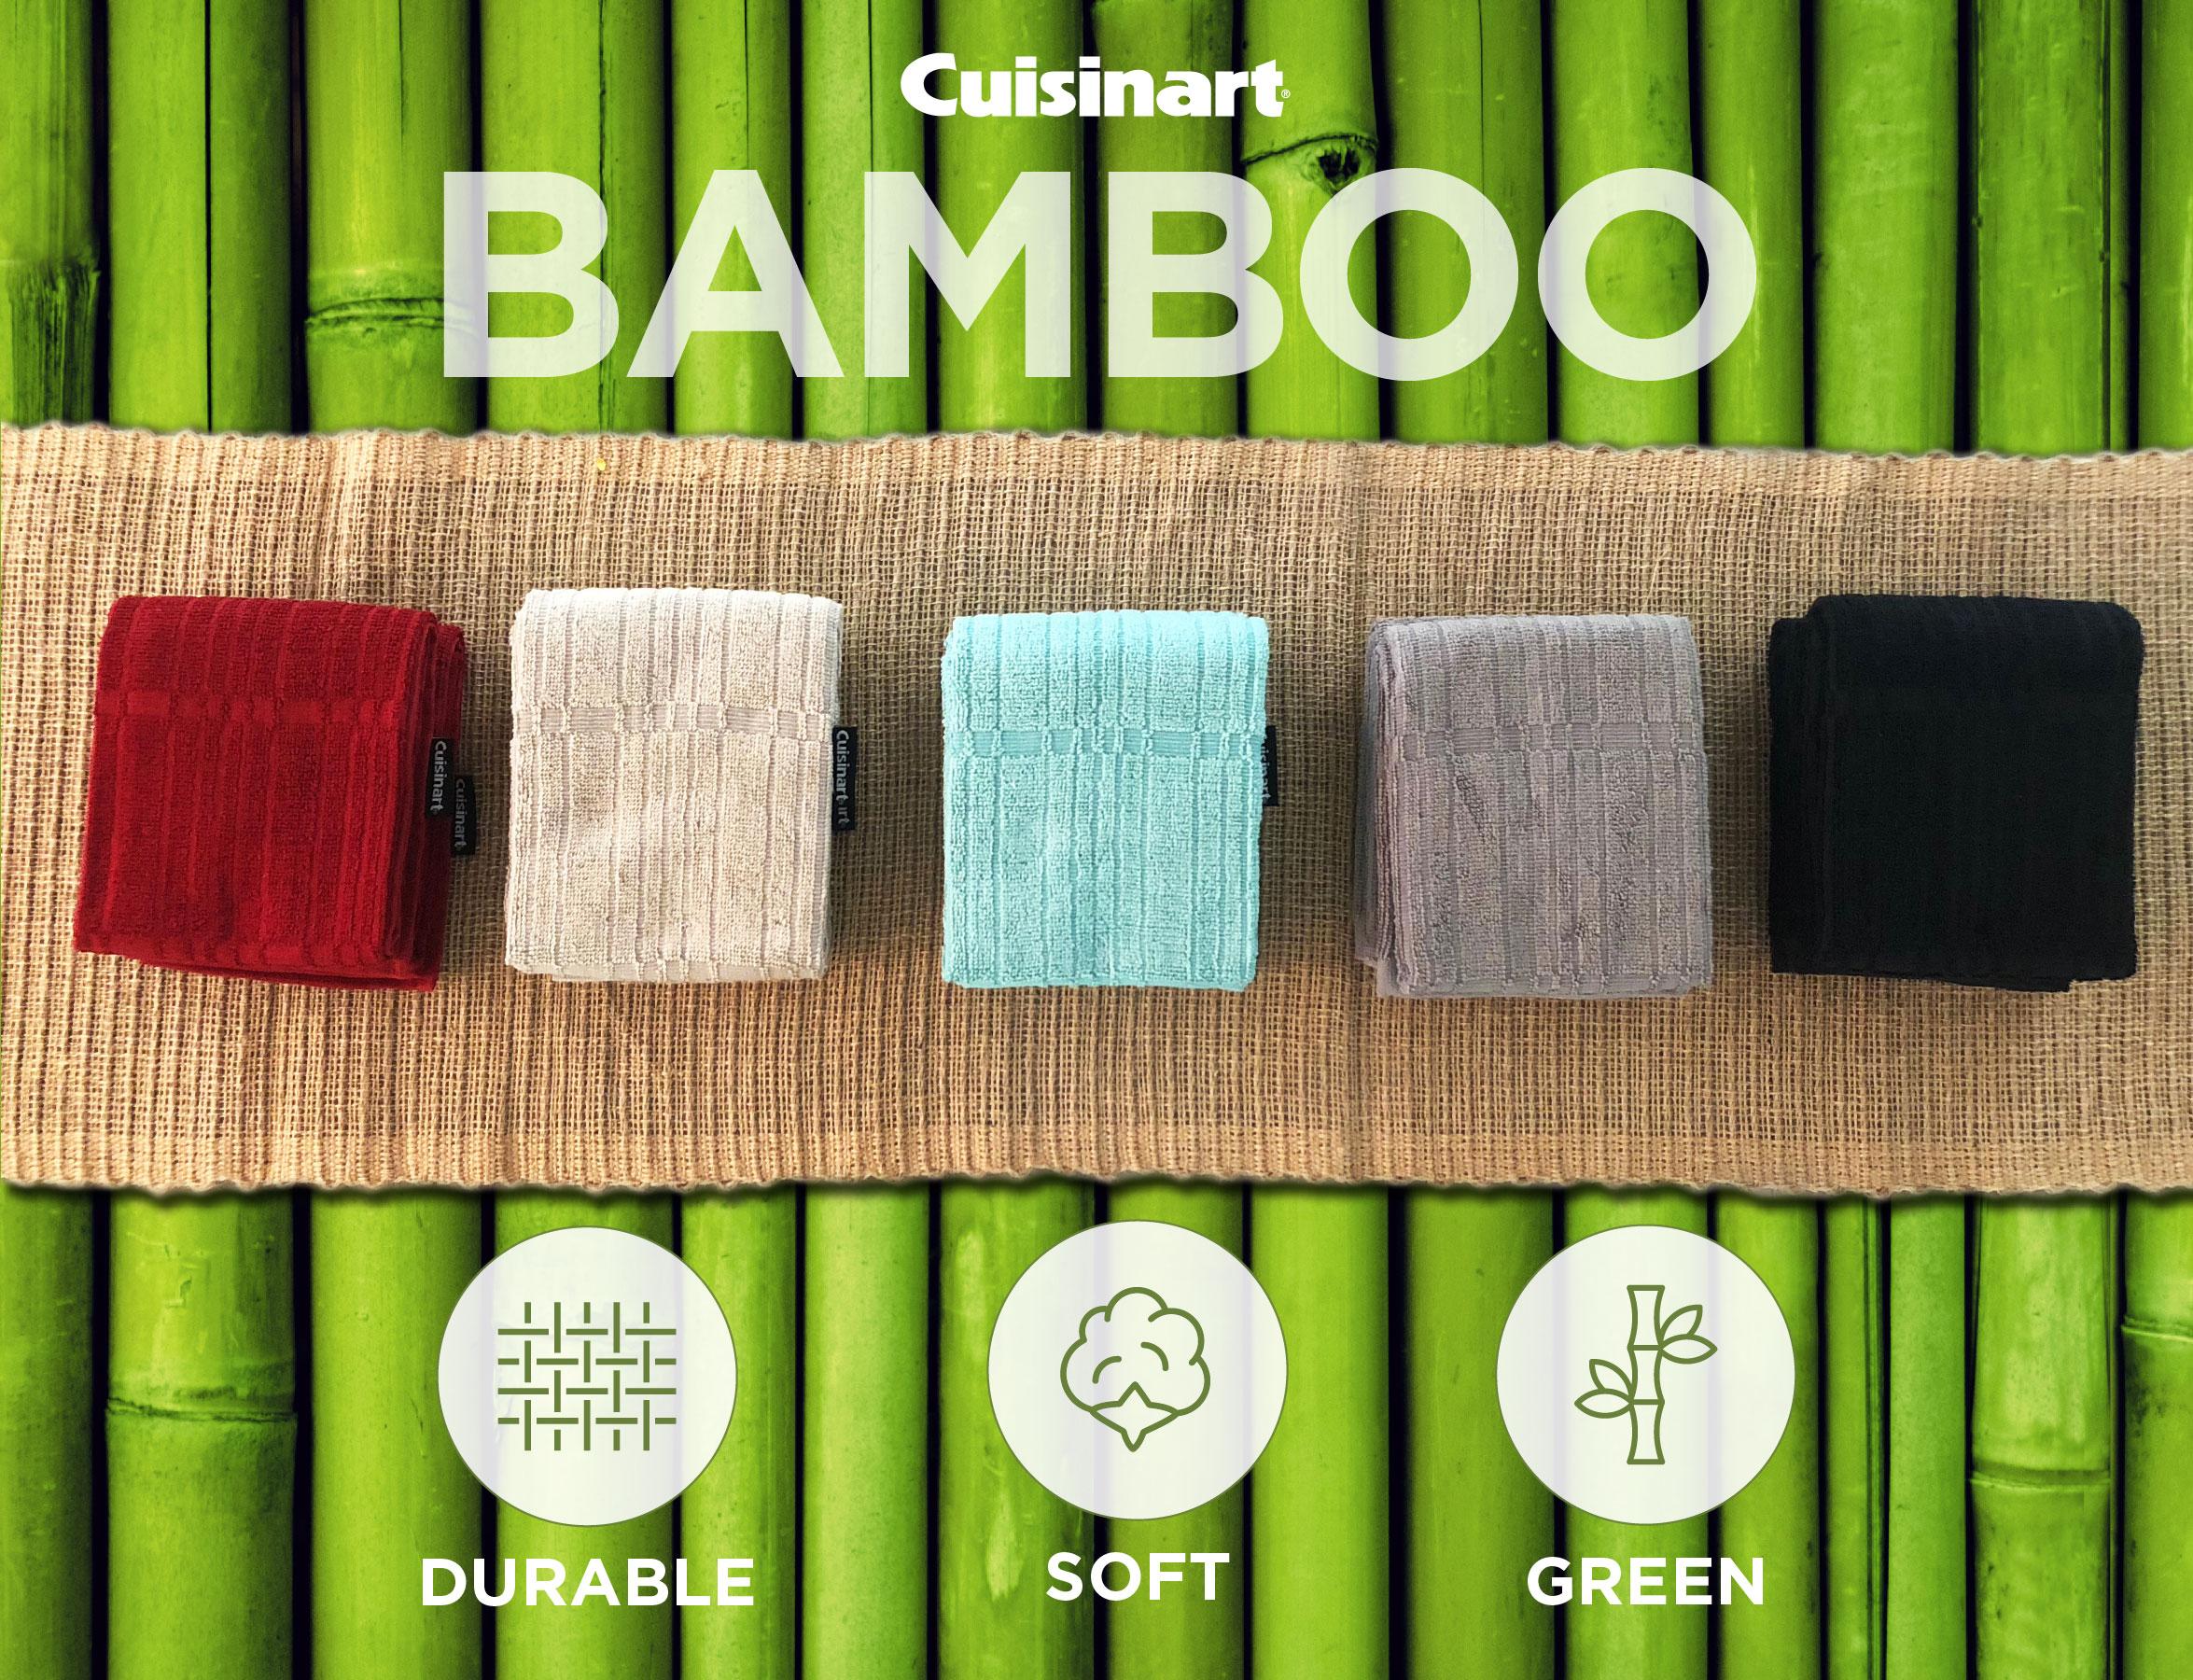 Details about Cuisinart Premium Bamboo/Cotton Fiber Blend Kitchen Towels-  Set of 2, 16\